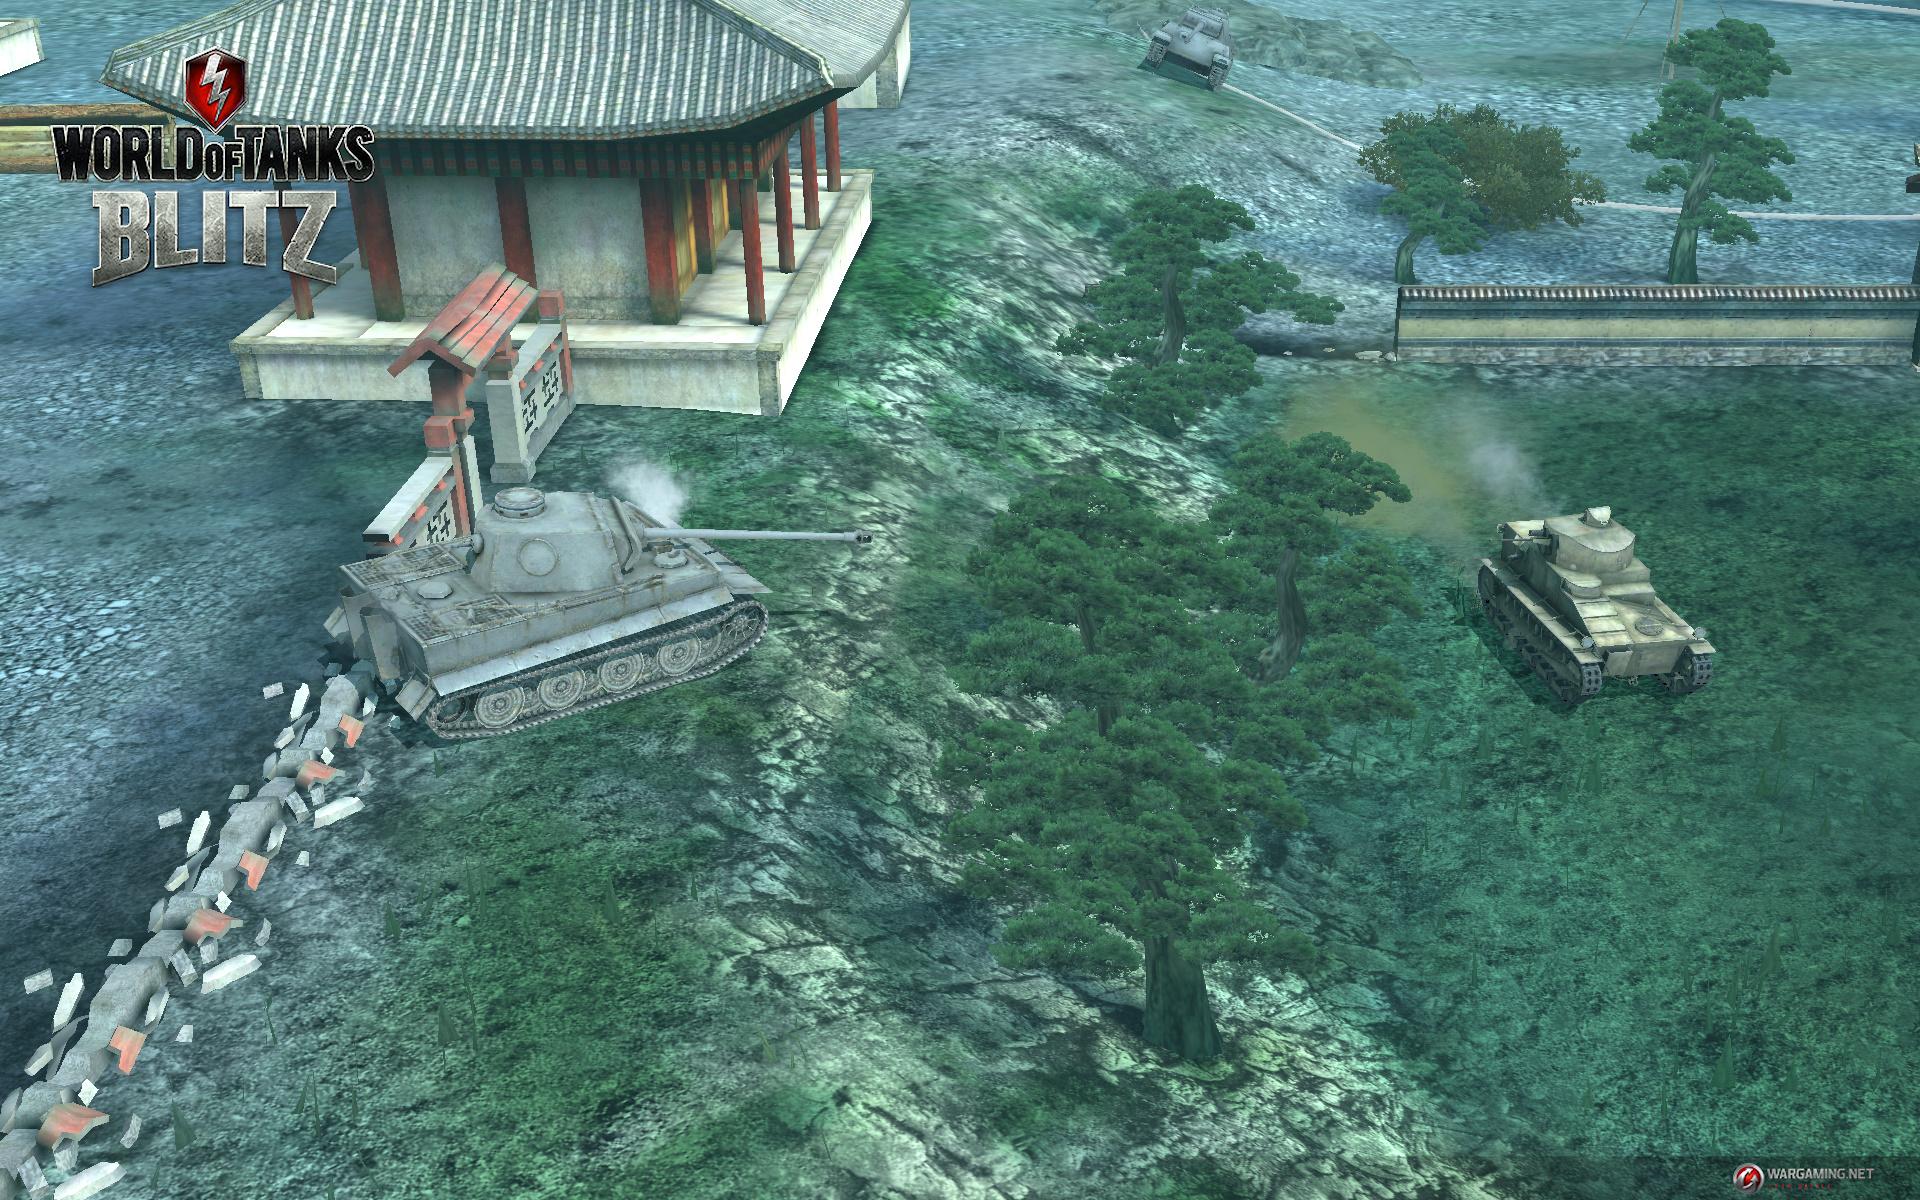 World-of-Tanks-Blitz-screenshot-2